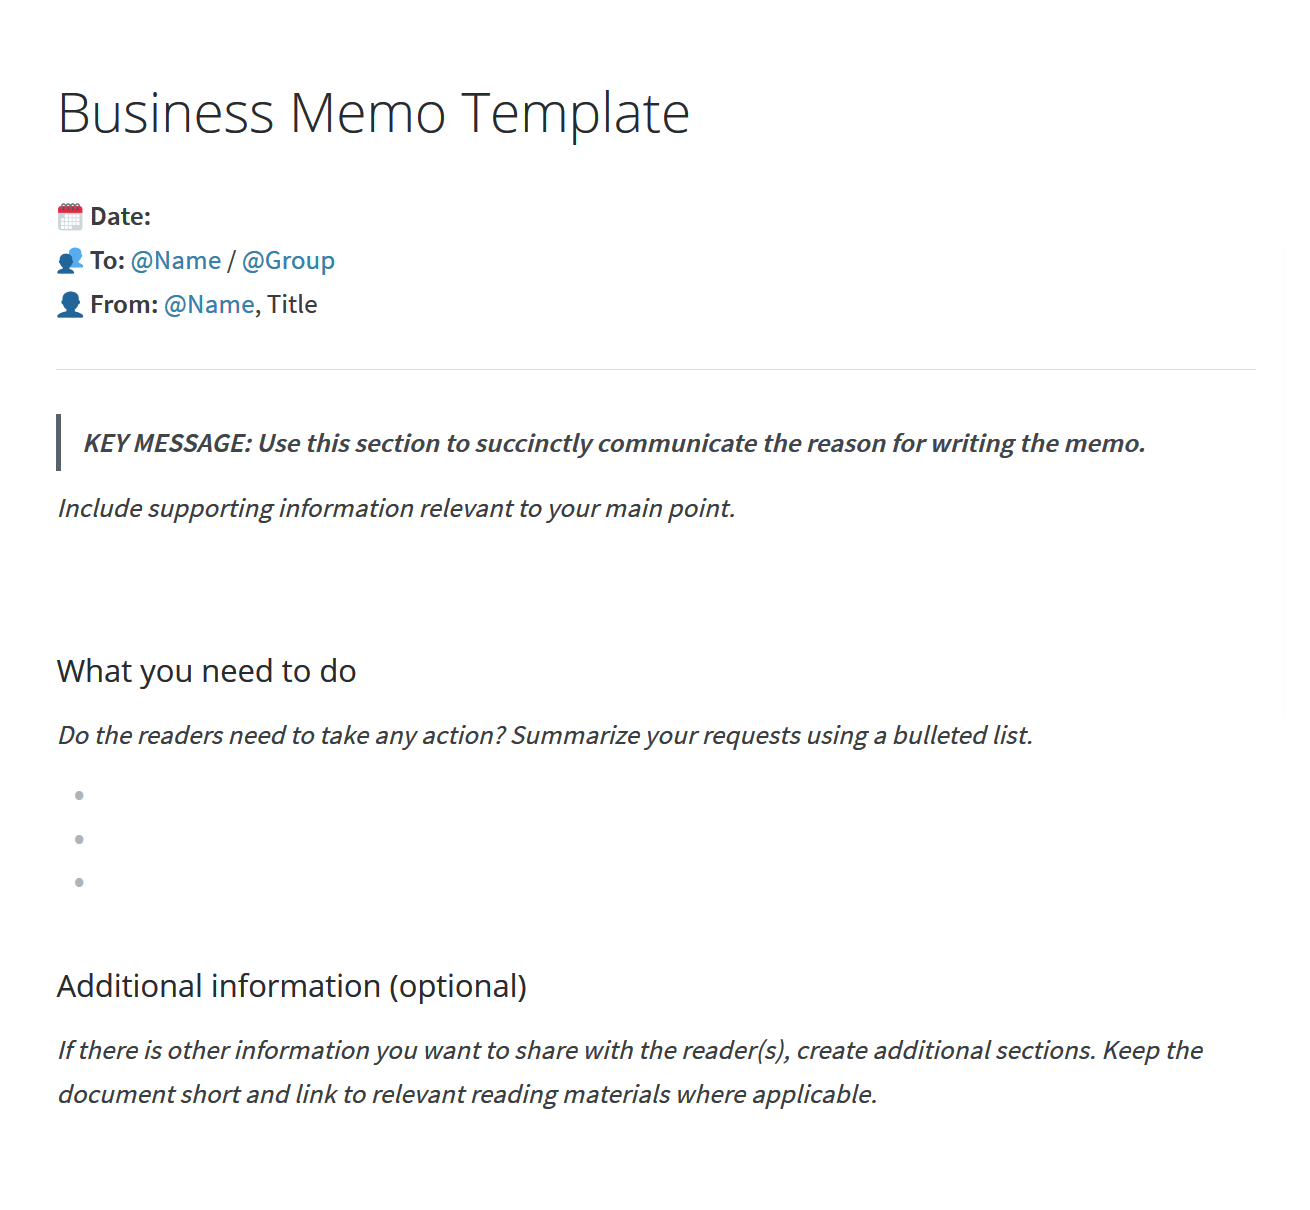 Business memo example